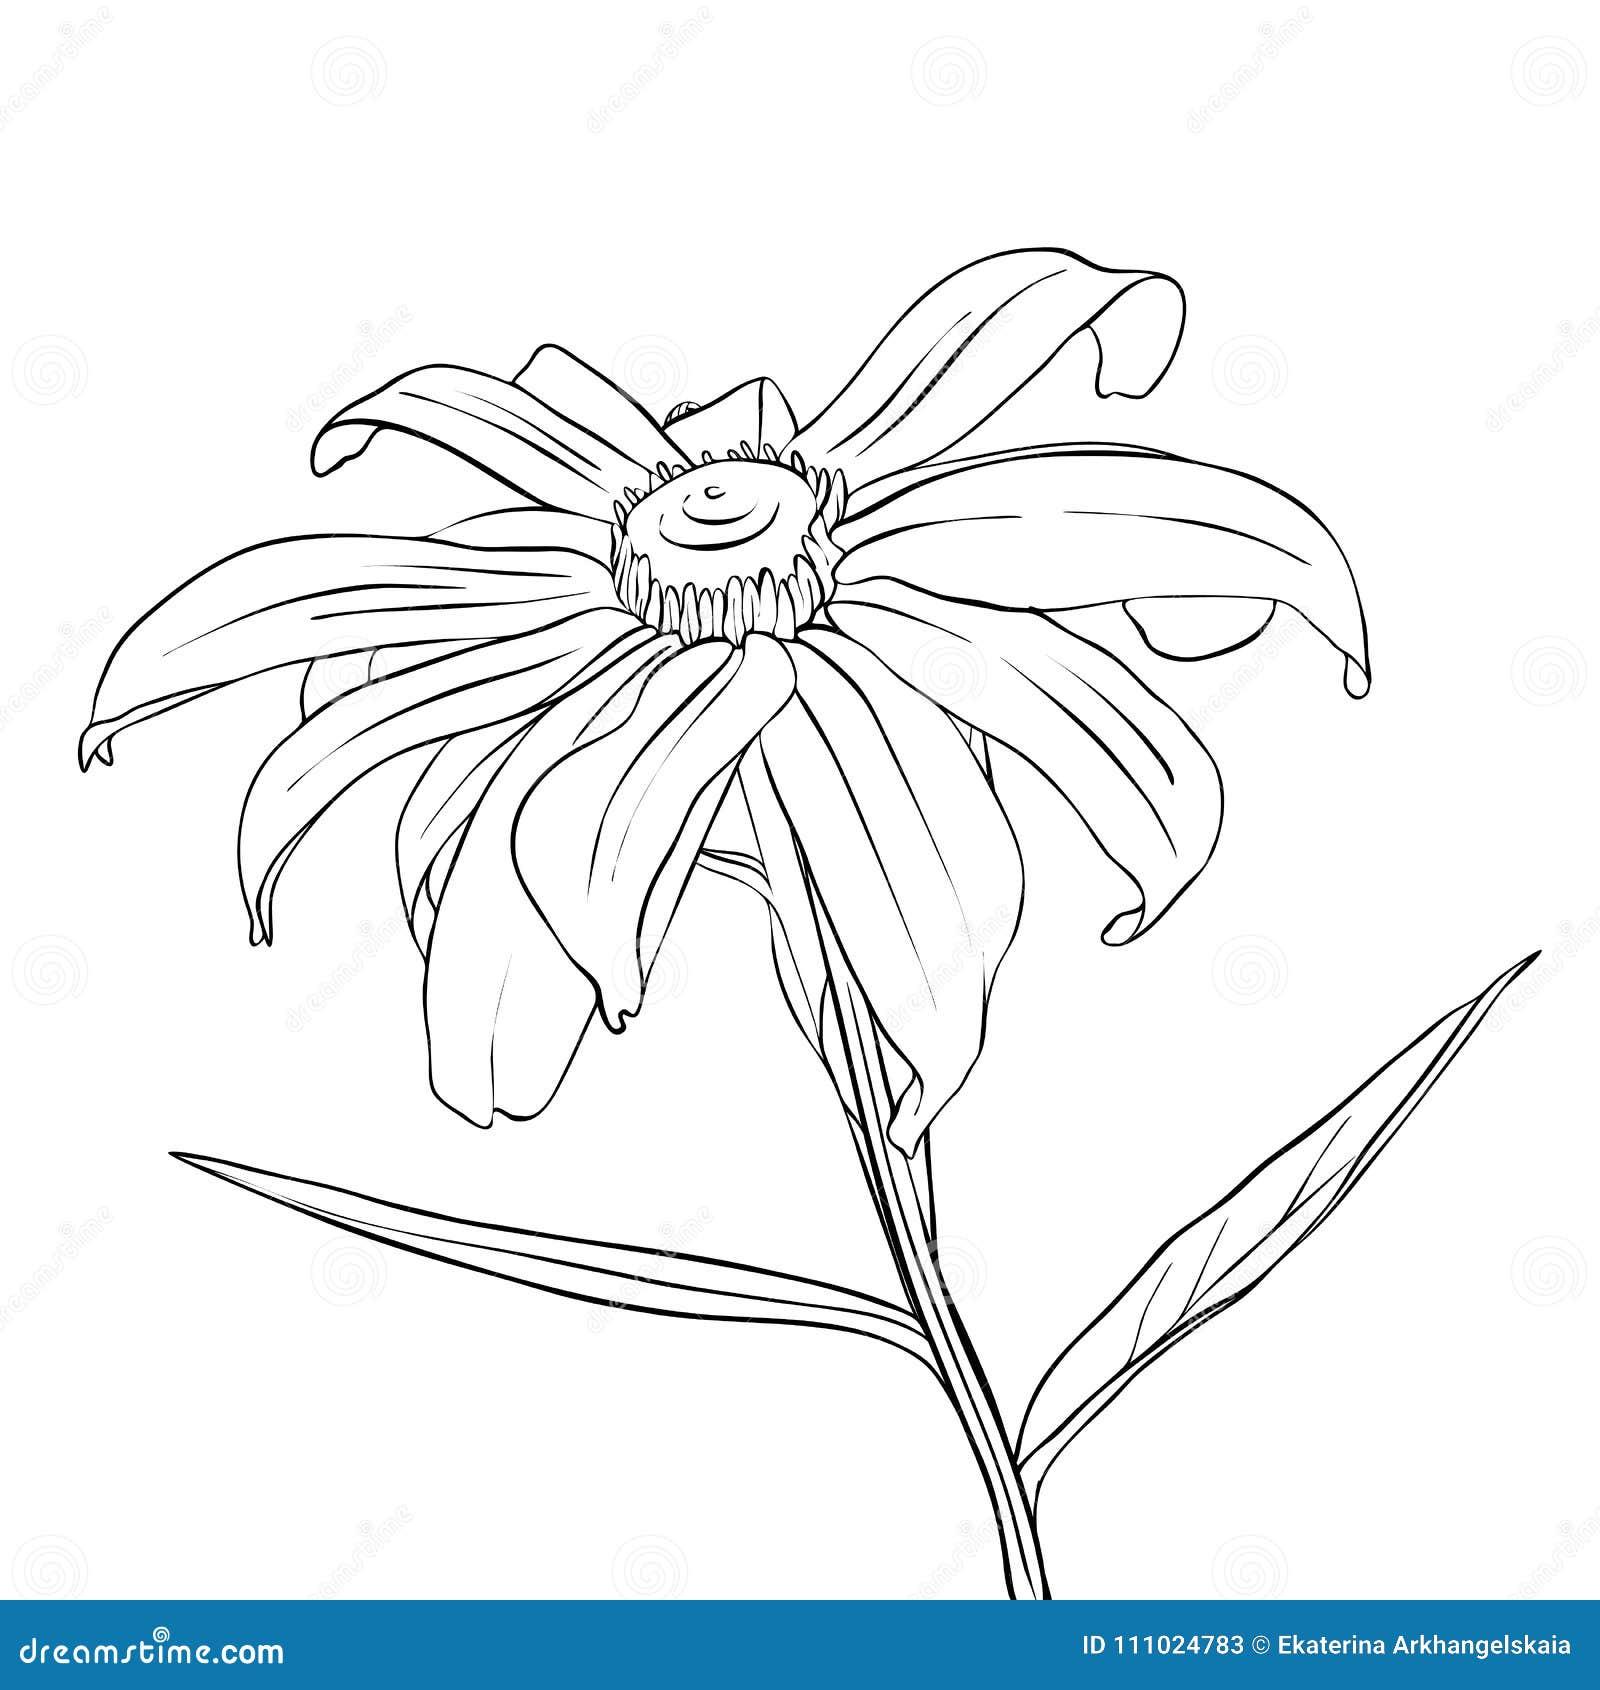 Vector drawing flower of daisy stock vector illustration of daisy vector drawing flower of daisy izmirmasajfo